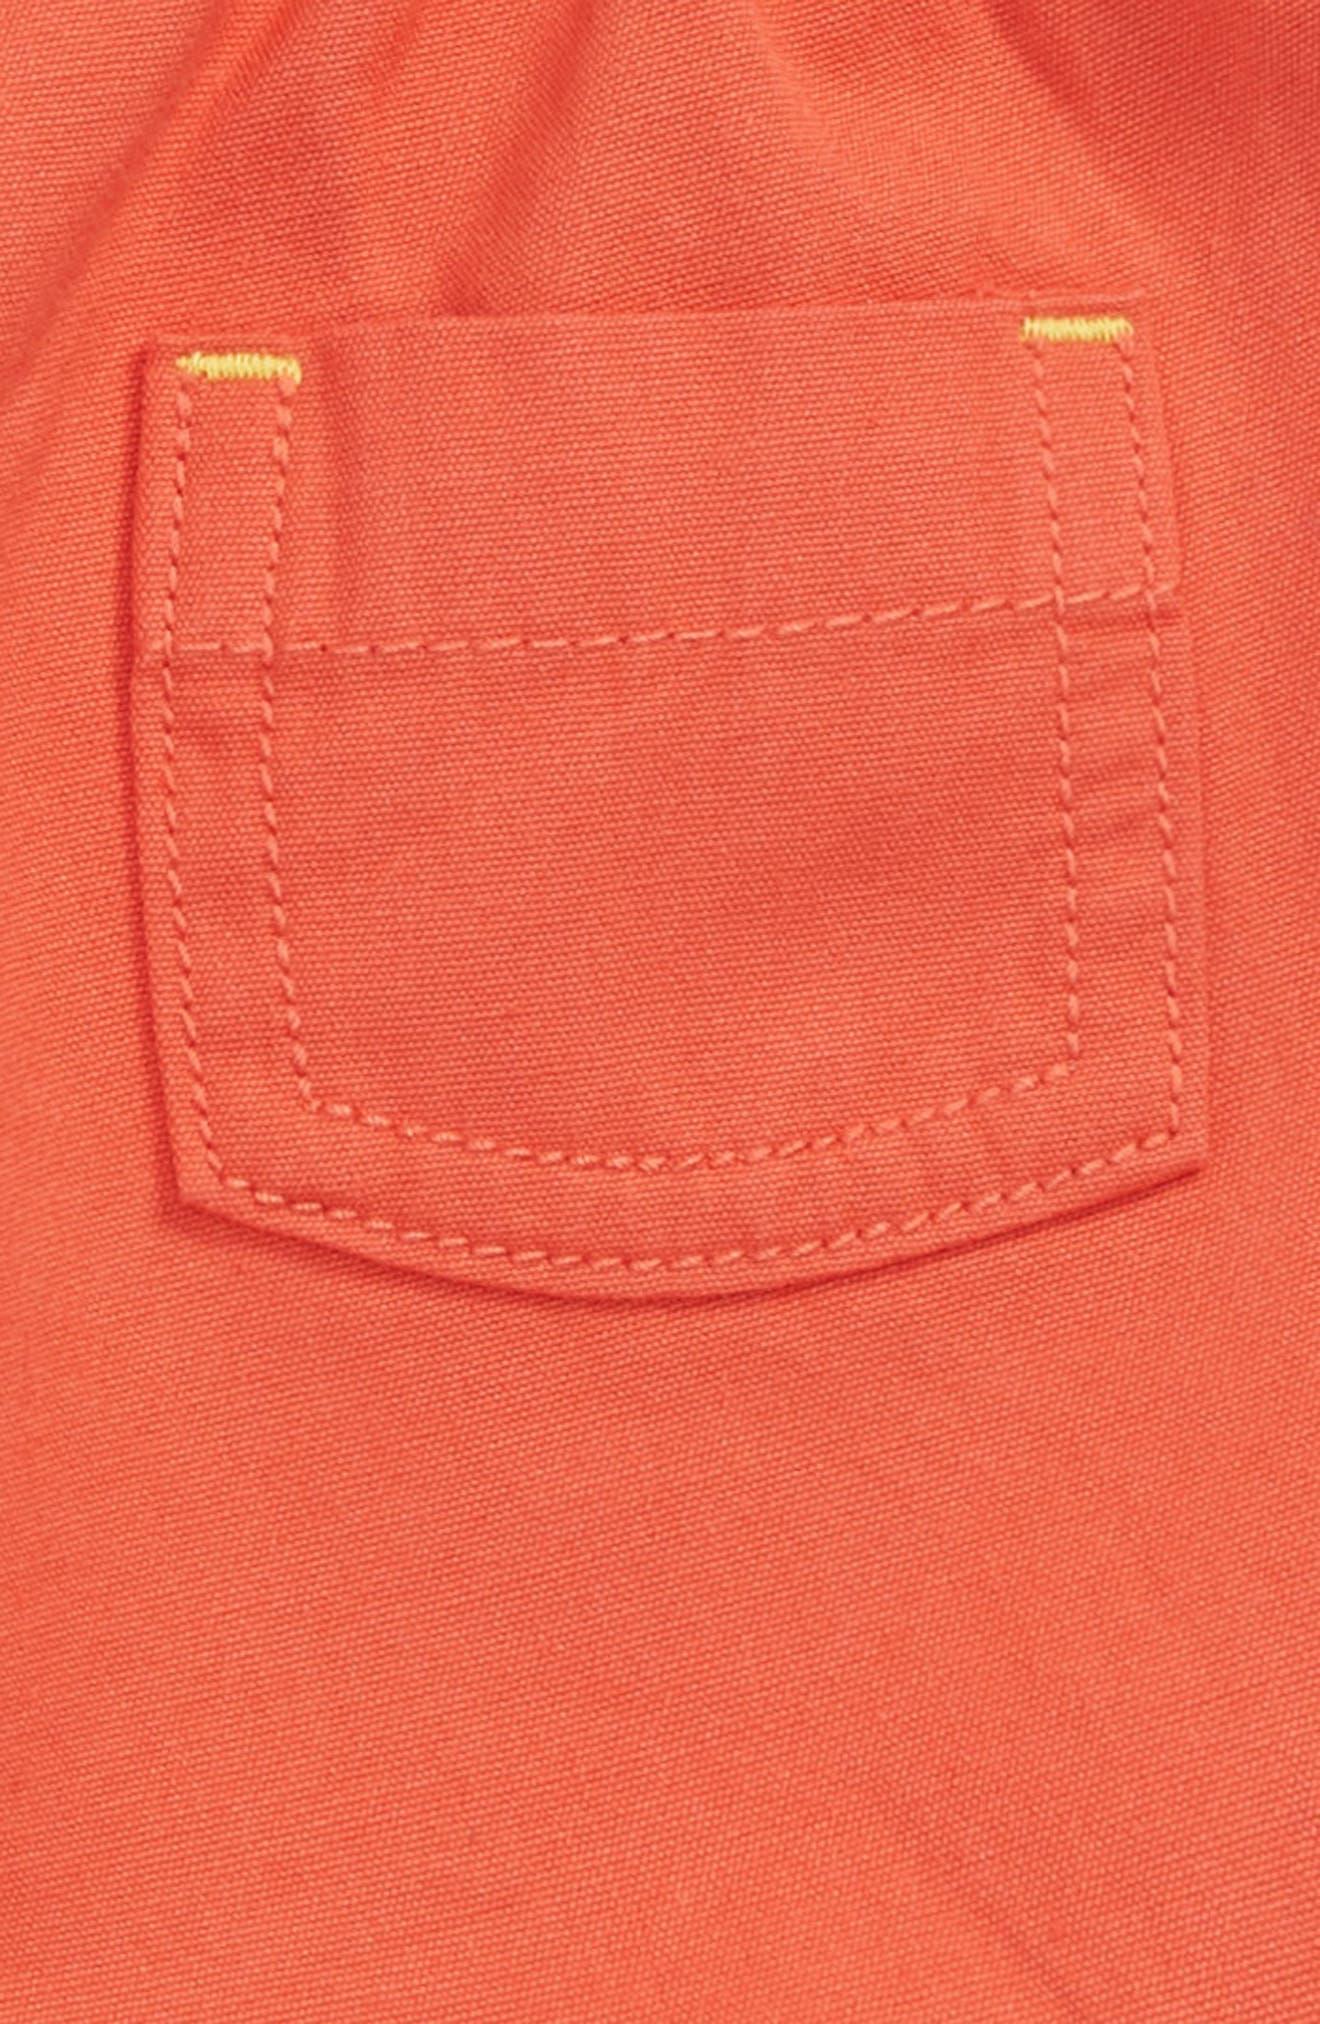 Explorer Shorts,                             Alternate thumbnail 3, color,                             Red Crayon